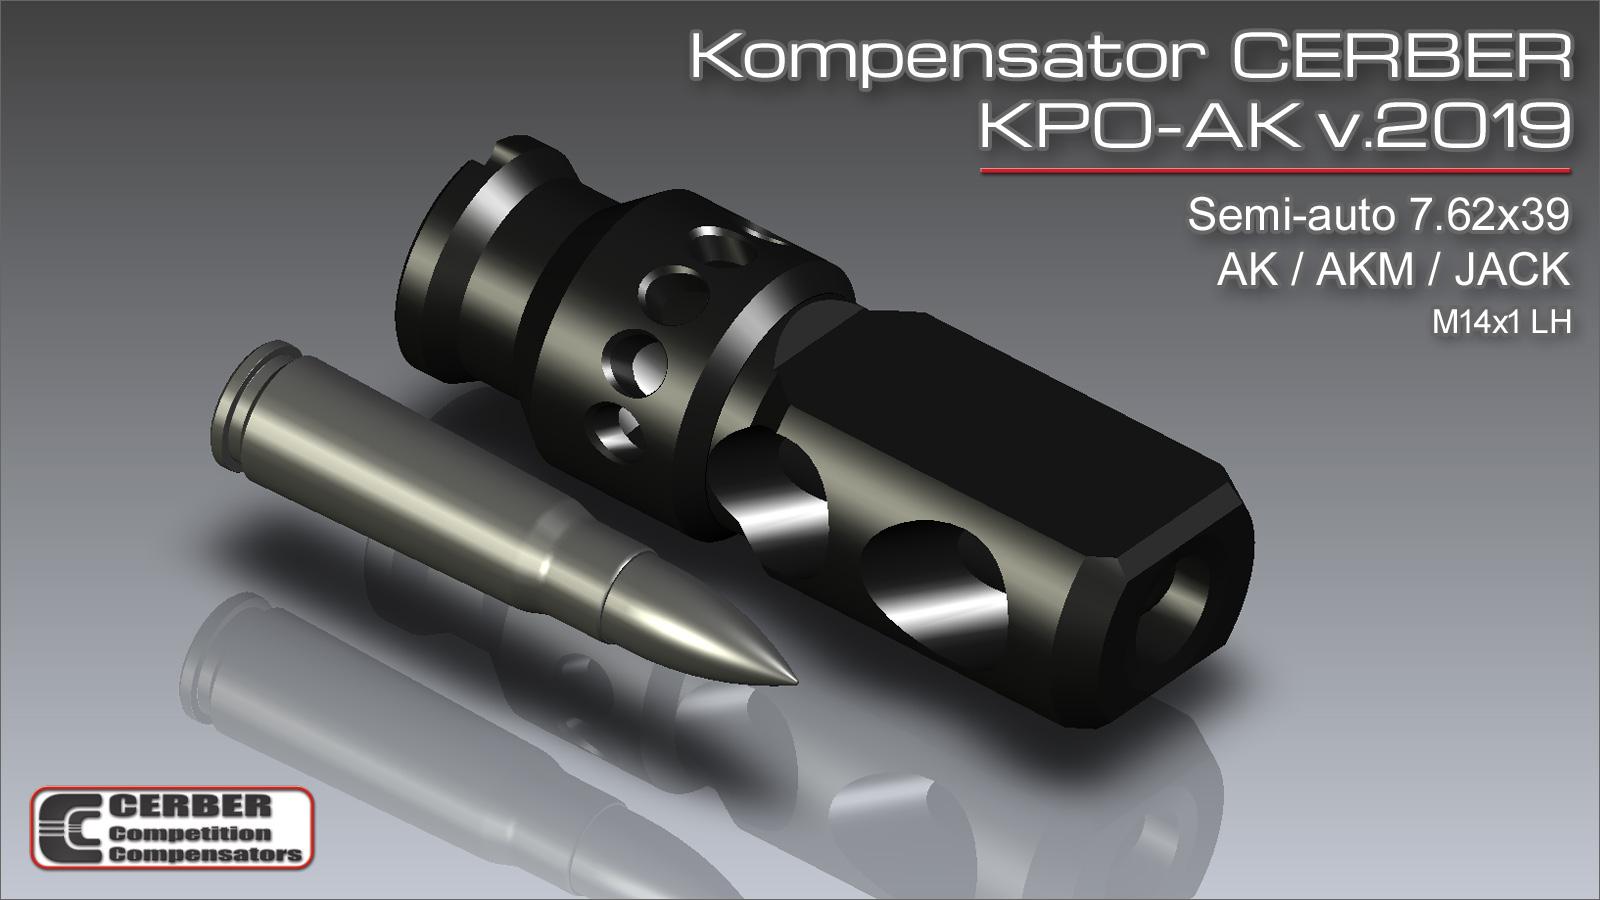 Kompensator Cerber KPO-AK v.2019